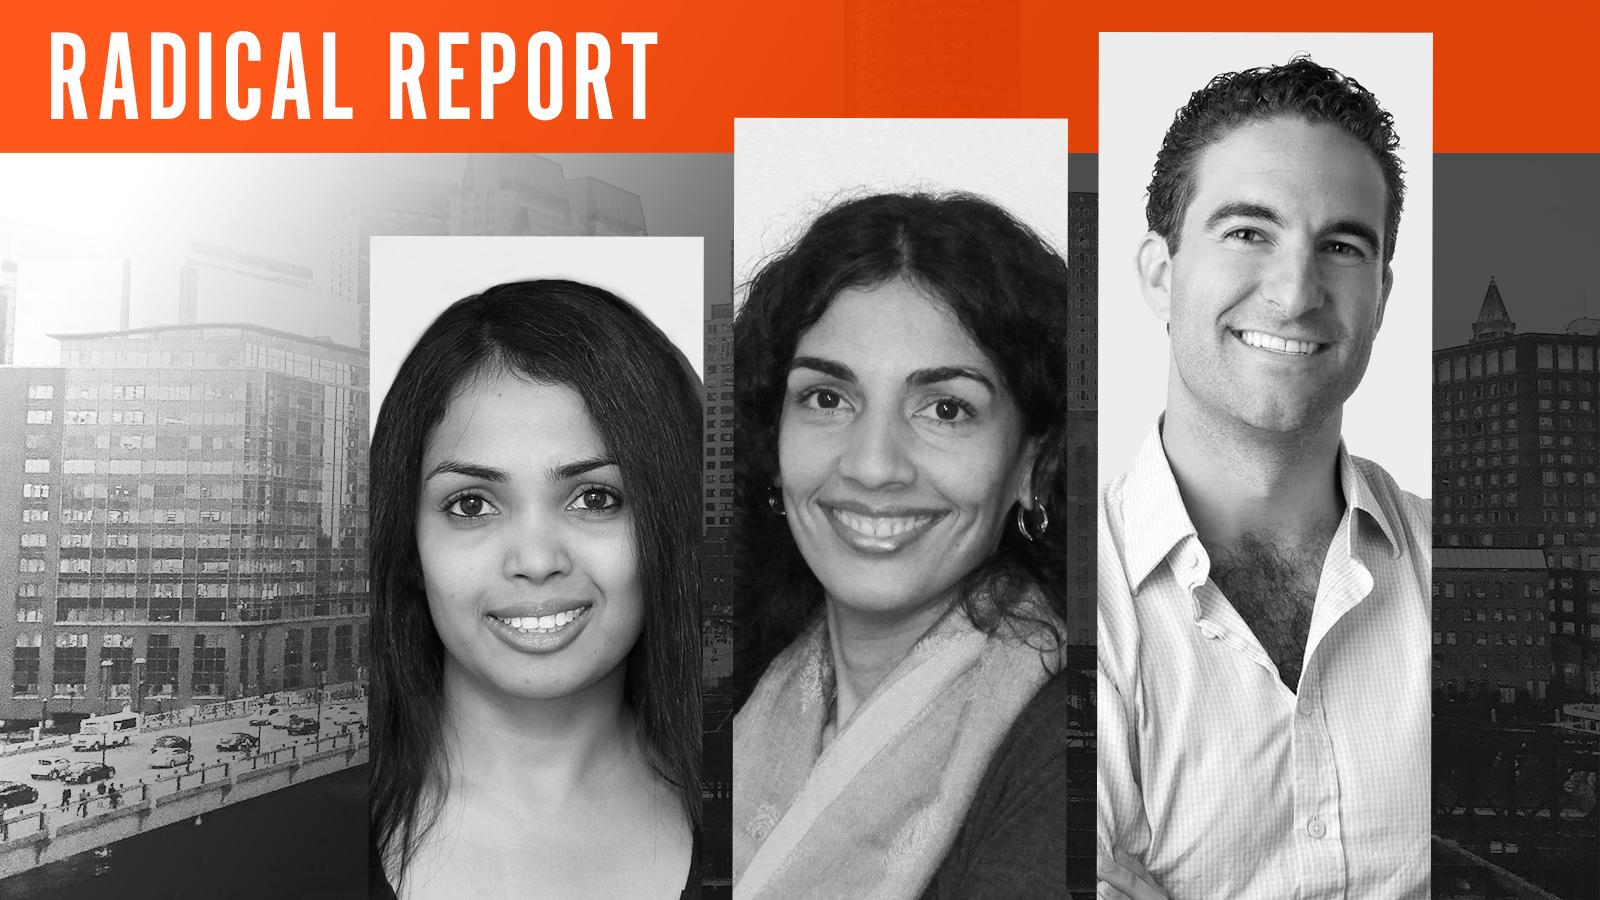 Radhika Dutt, Nidhi Aggarwal, Geordie Kaytes  Radical Report I